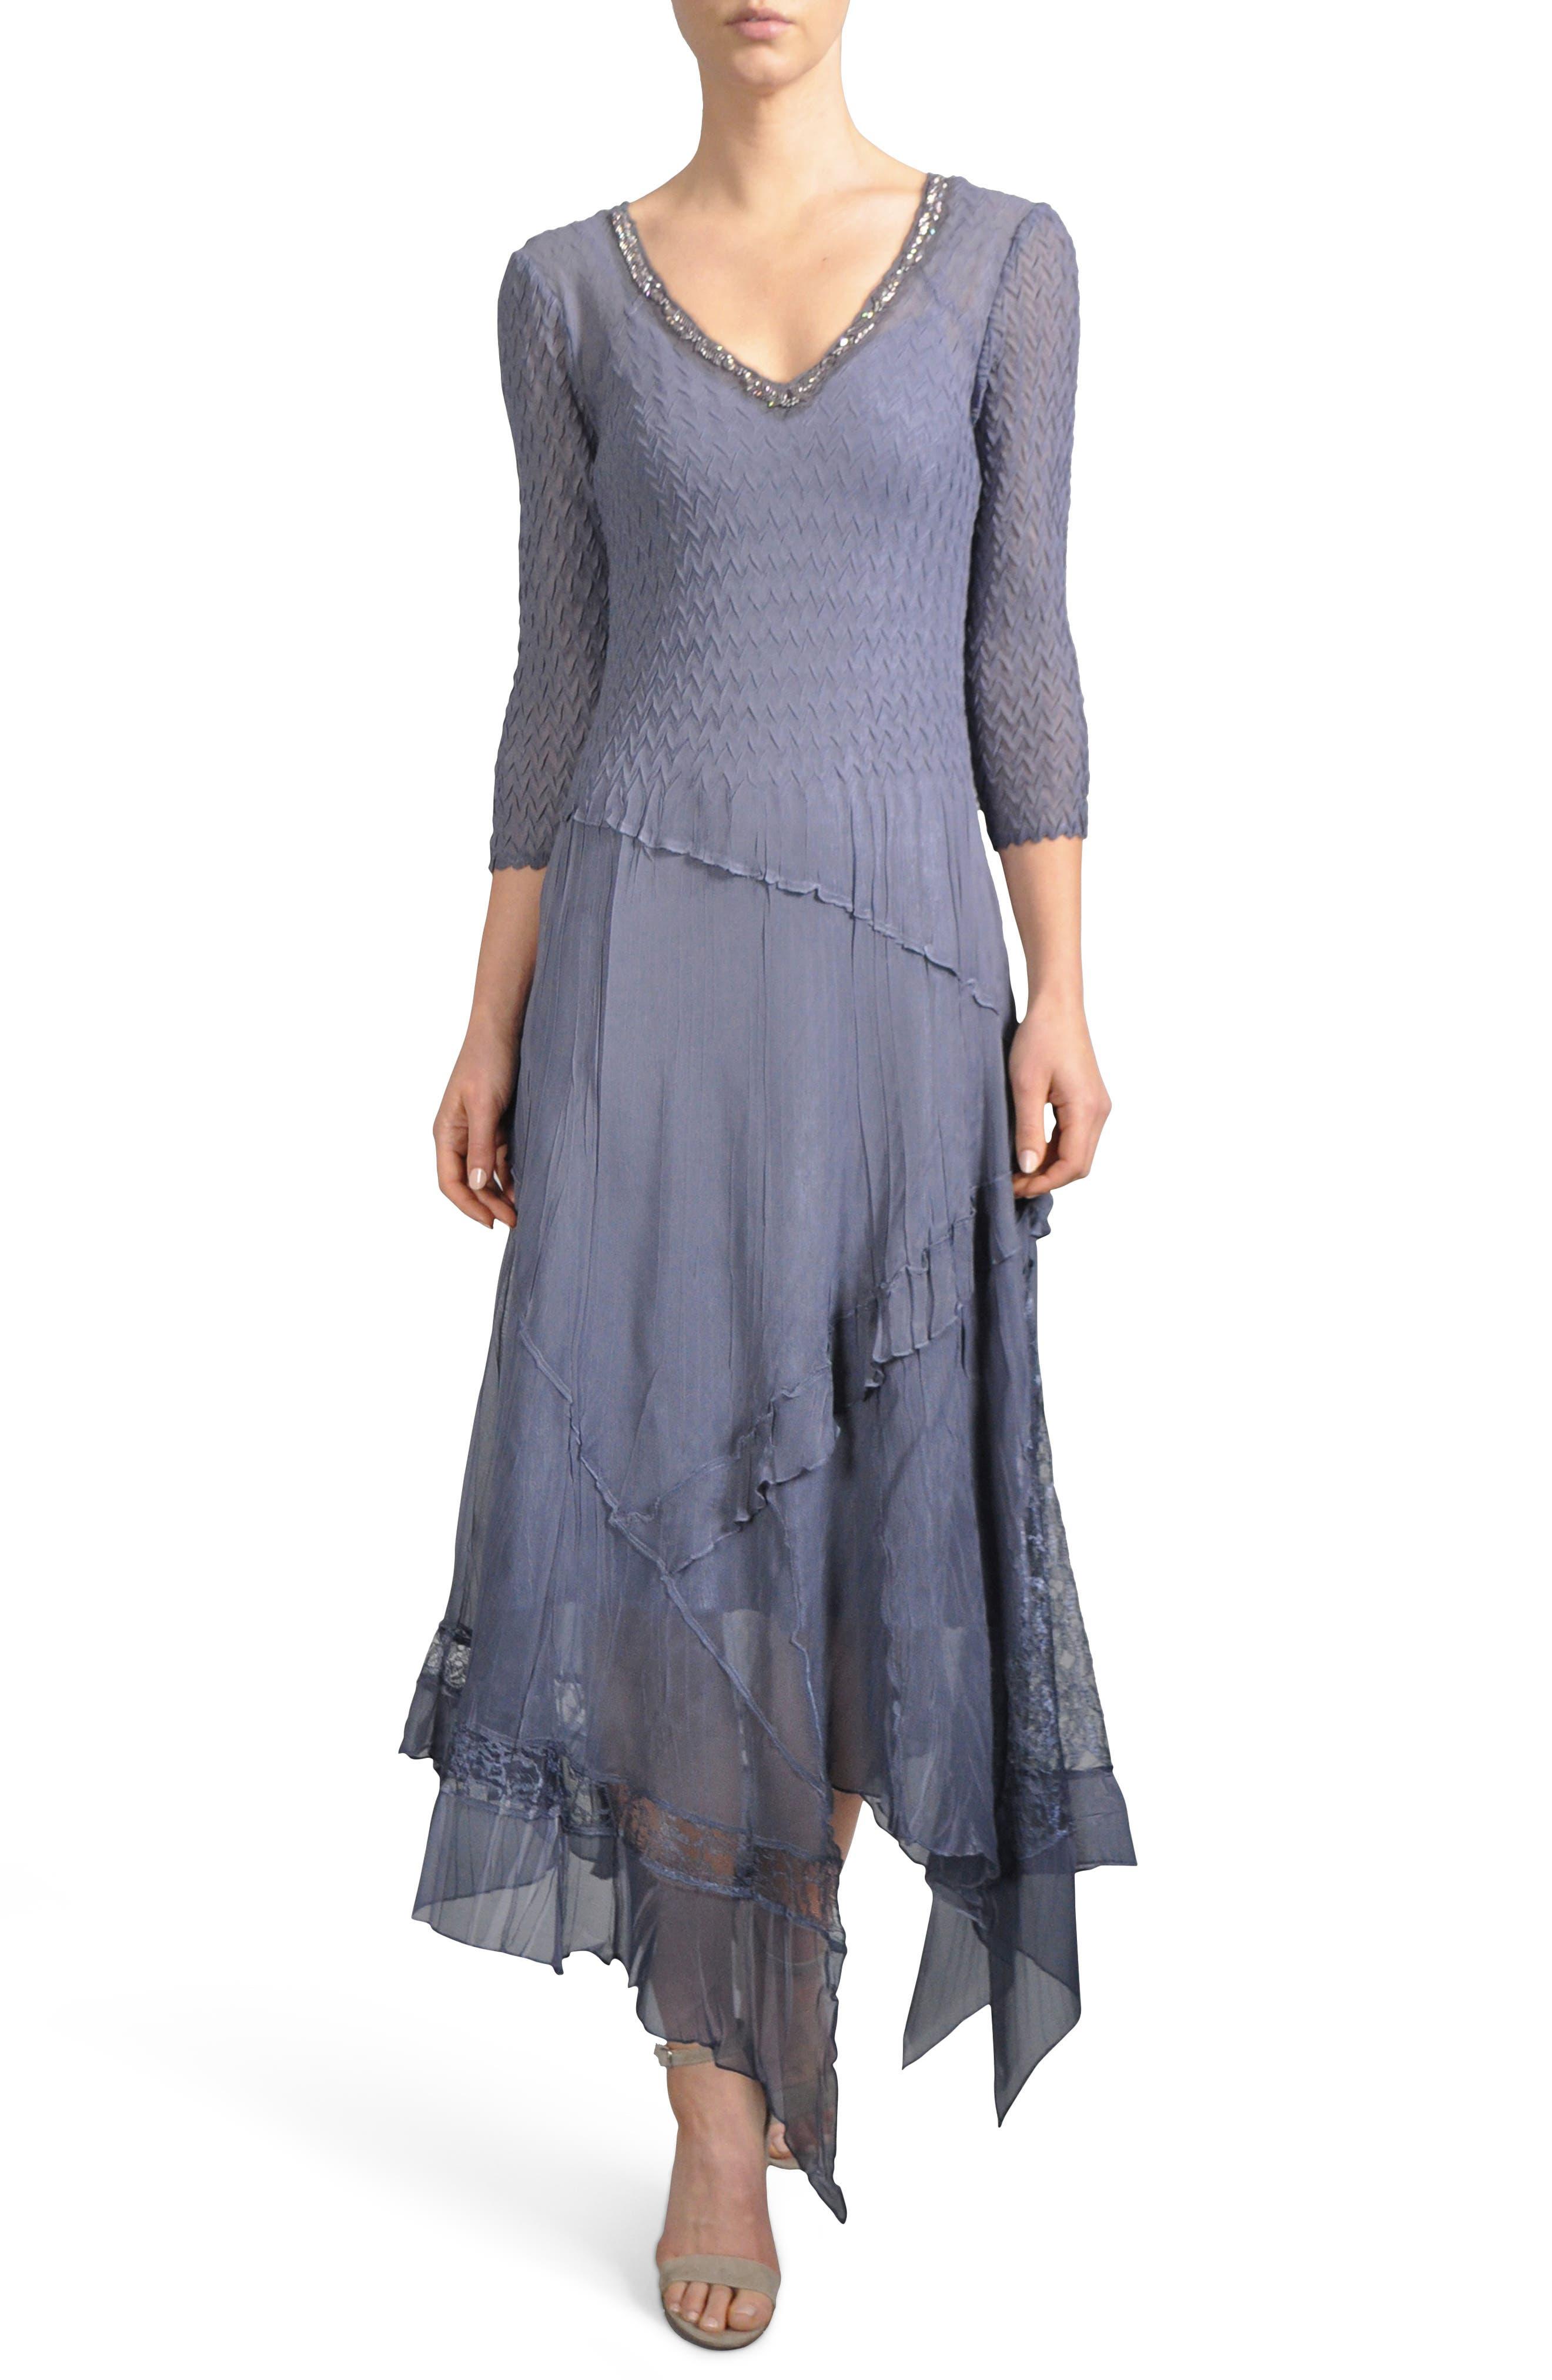 Alternate Image 1 Selected - Komarov Beaded Neck Handkerchief Hem Dress